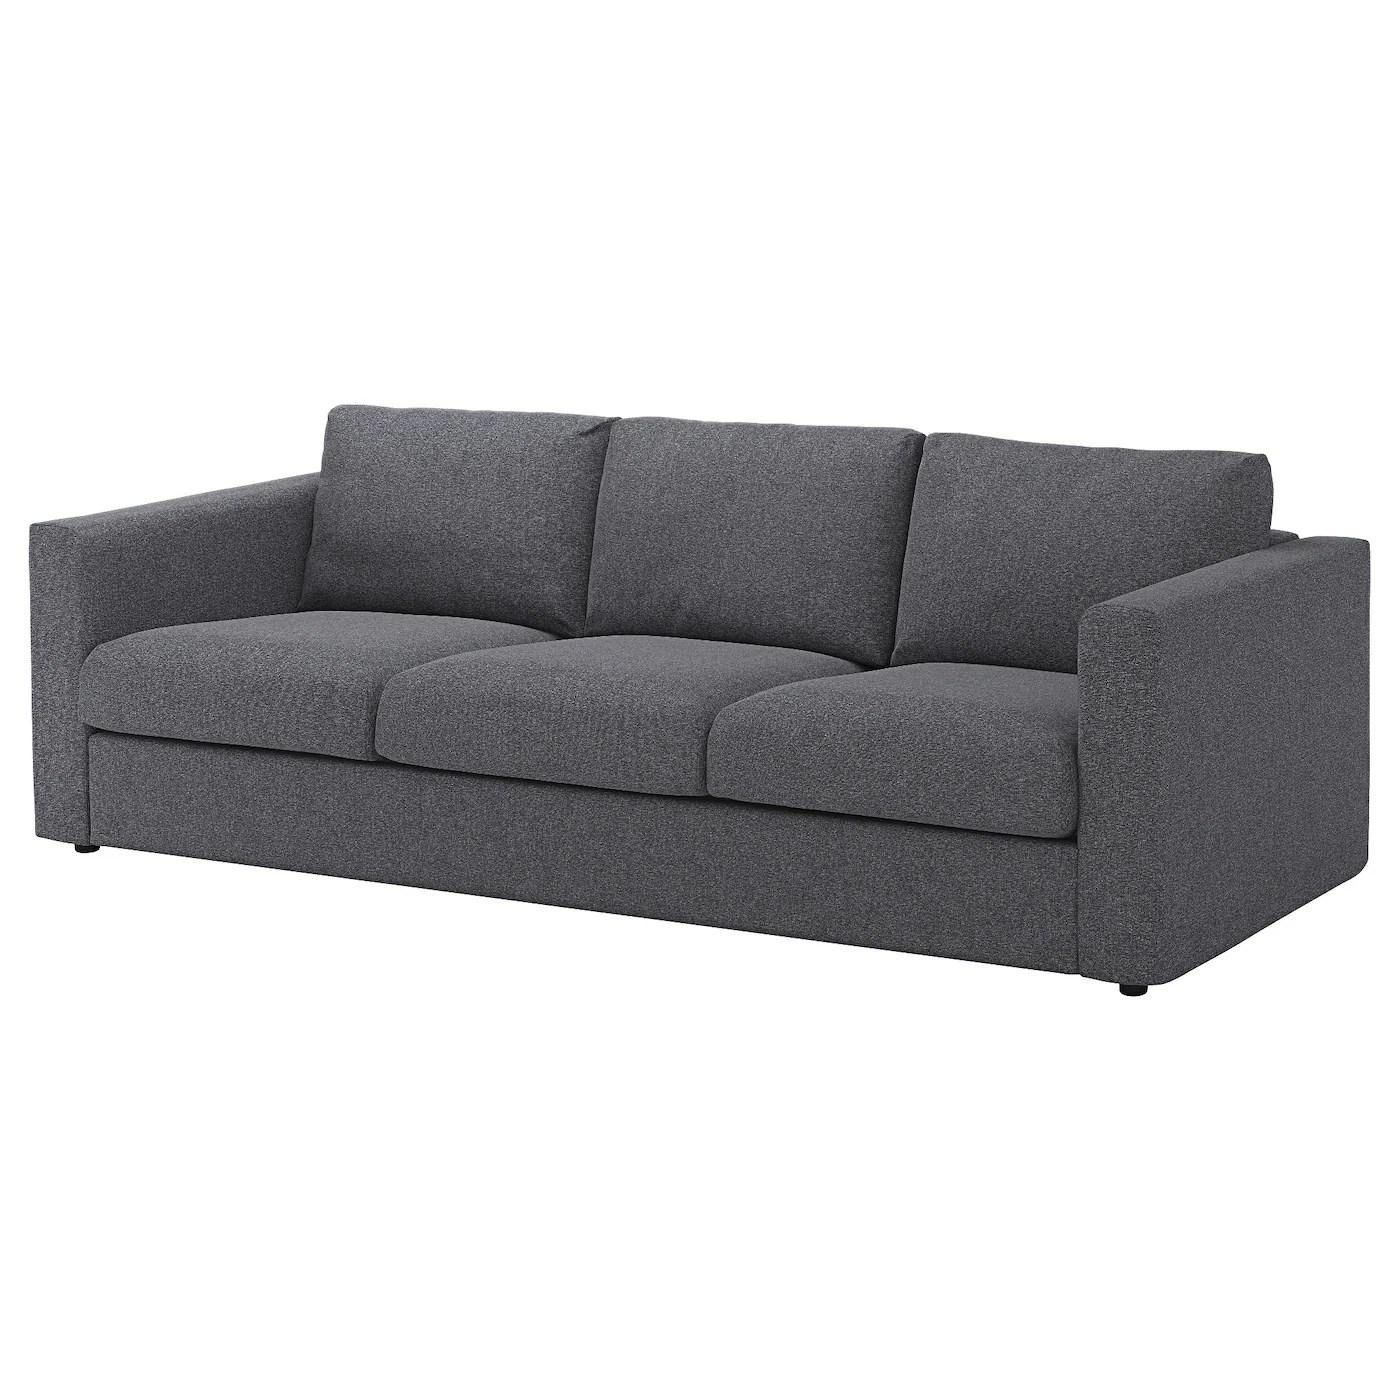 Canaps 3 Places IKEA